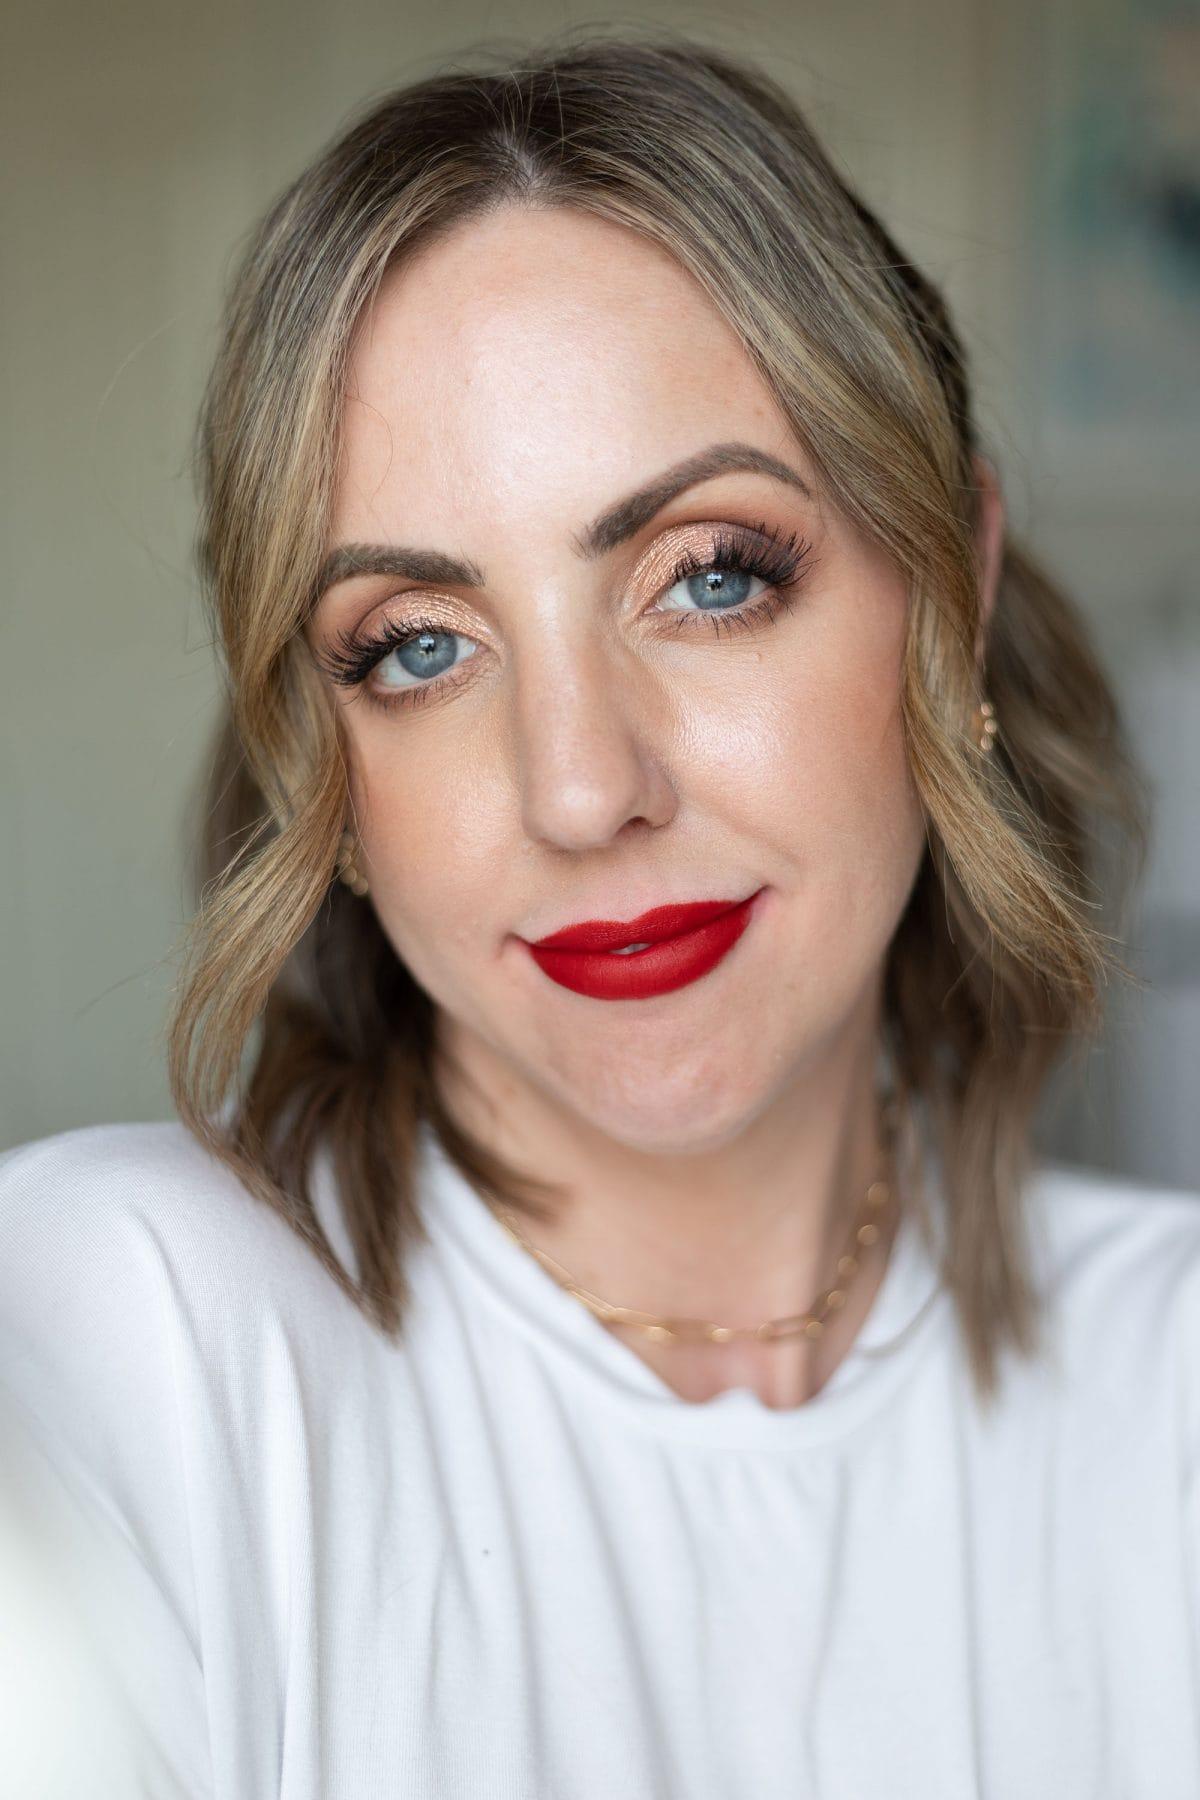 Maybelline Ultimatte Slim Lipstick in More Scarlet lip swatch